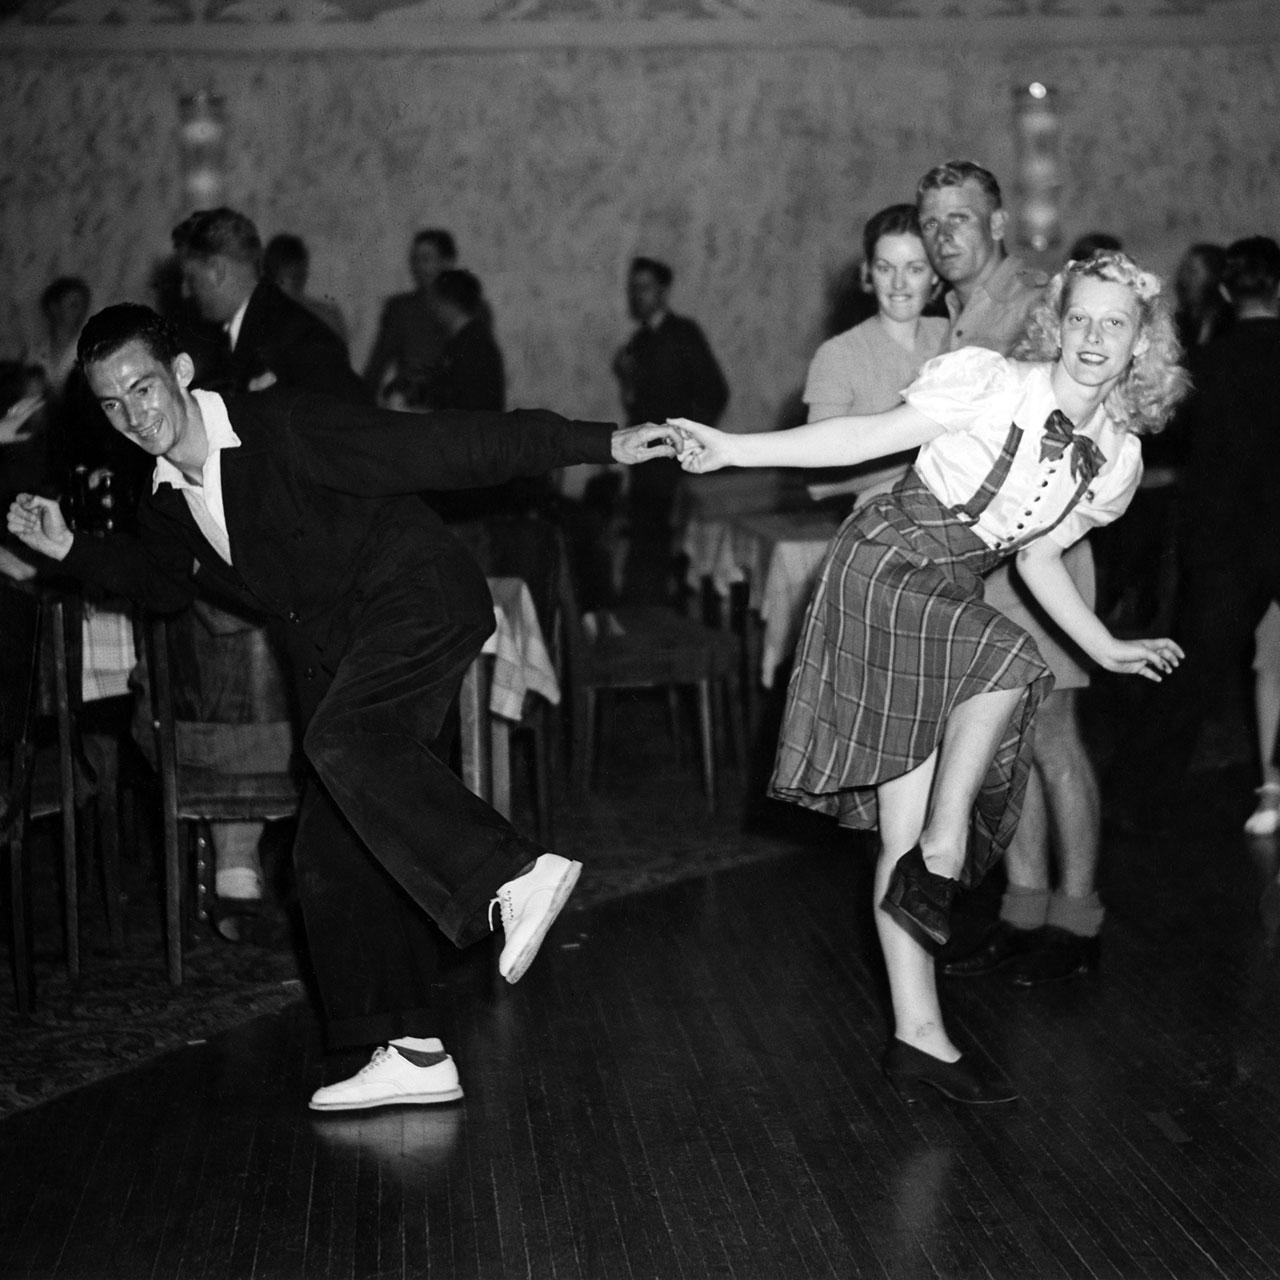 George and champion dancer Mavis Lang jitterbug, Trocadero, 16 March 1941. (Digital ID: a2391058)